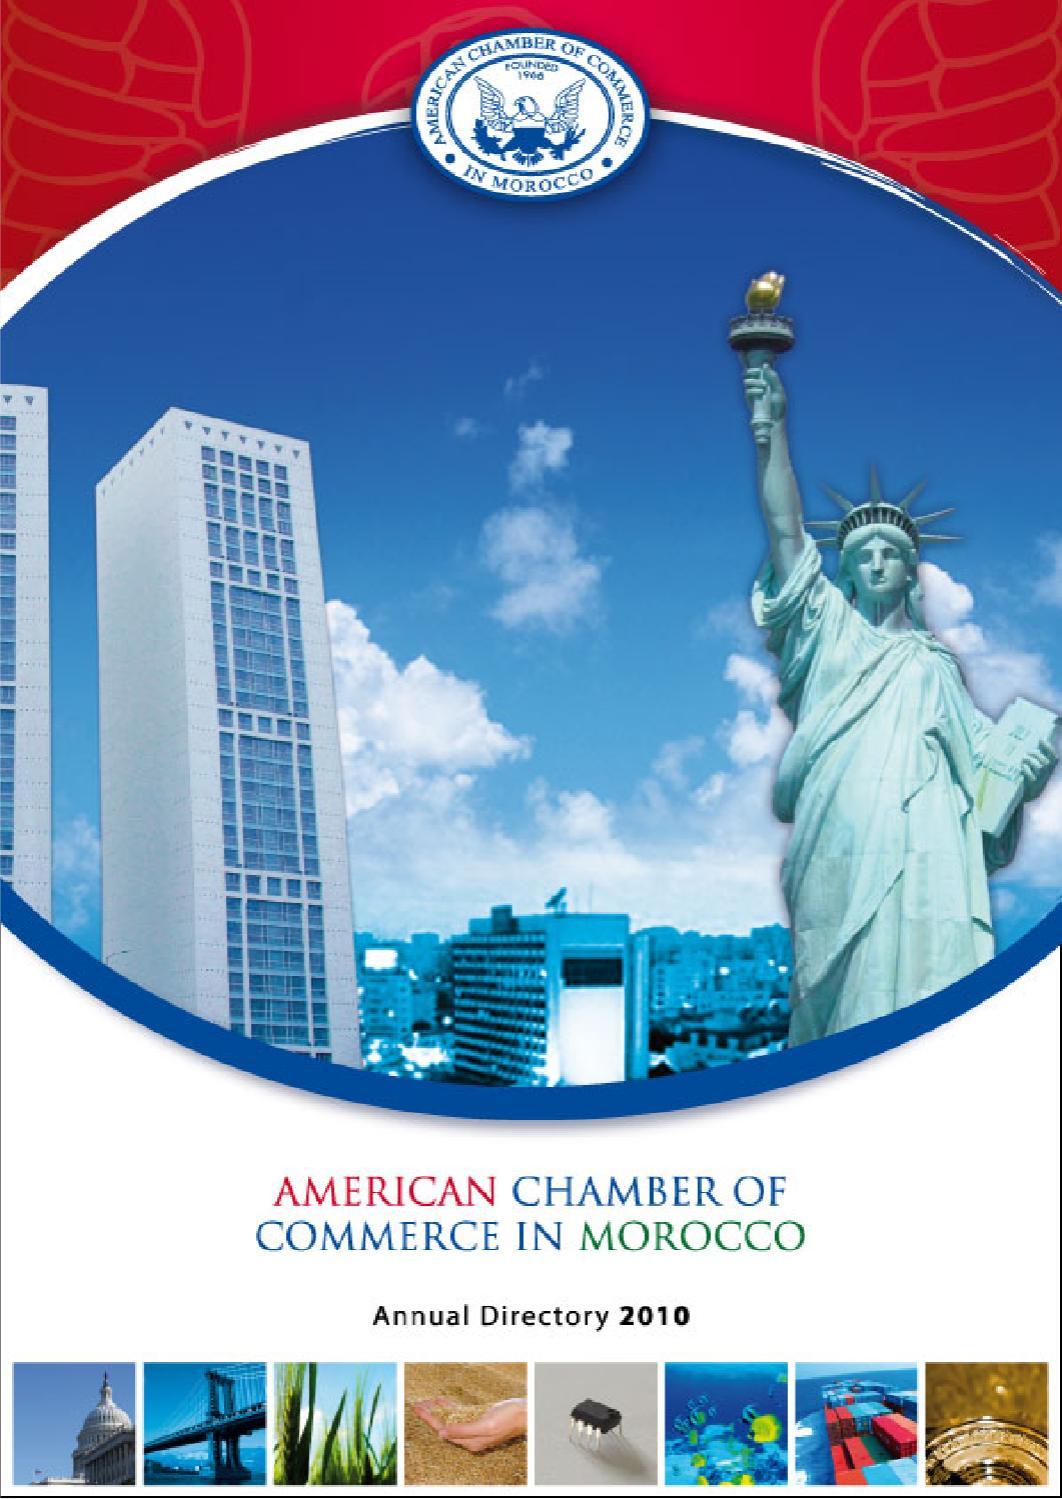 AmCham Annual Directory 2010 by AmCham Morocco - issuu